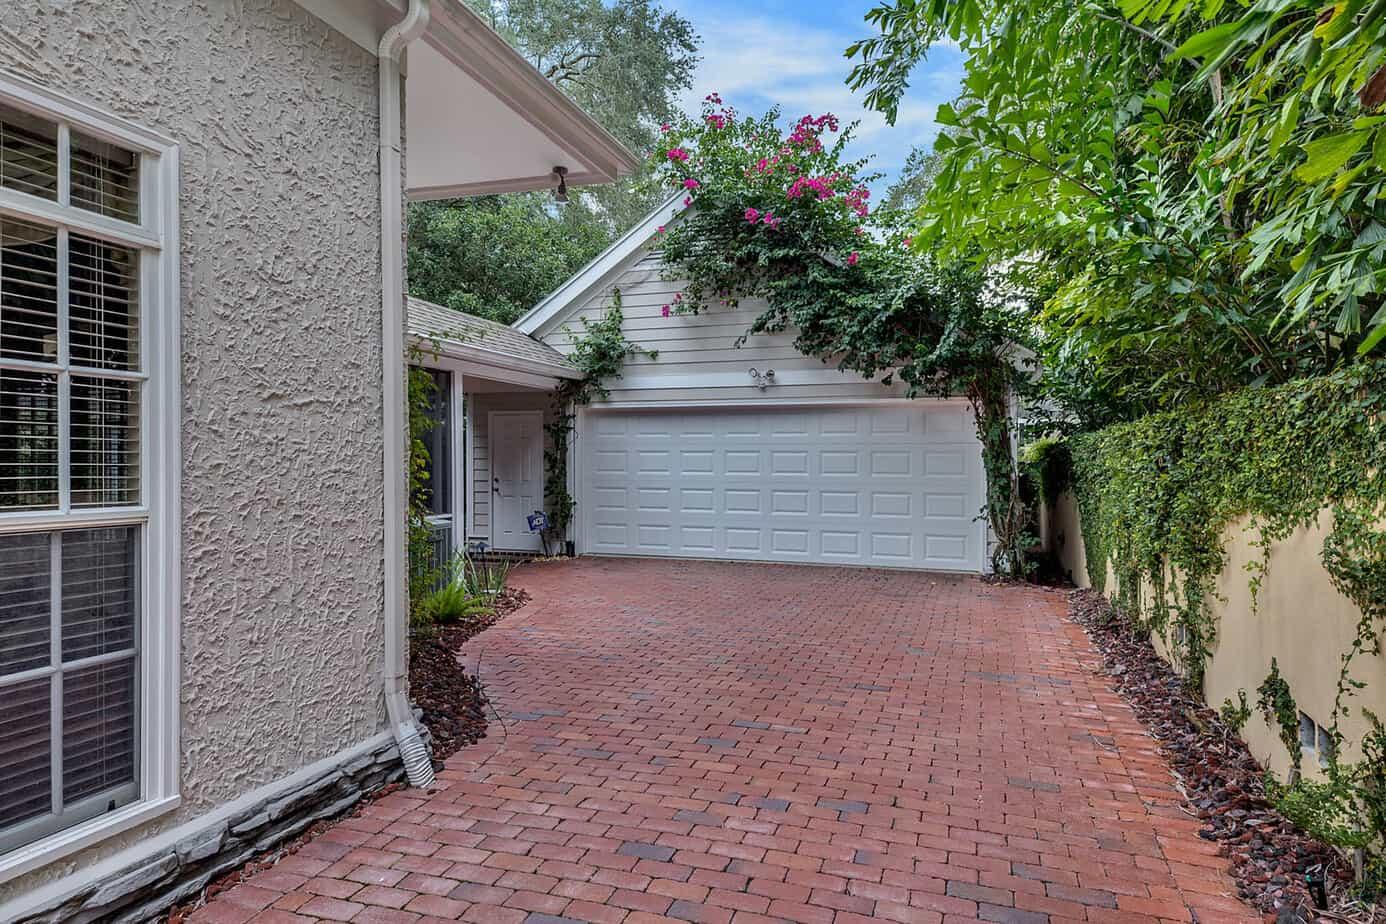 3110 W Fair Oaks Ave. Tampa, FL 33611